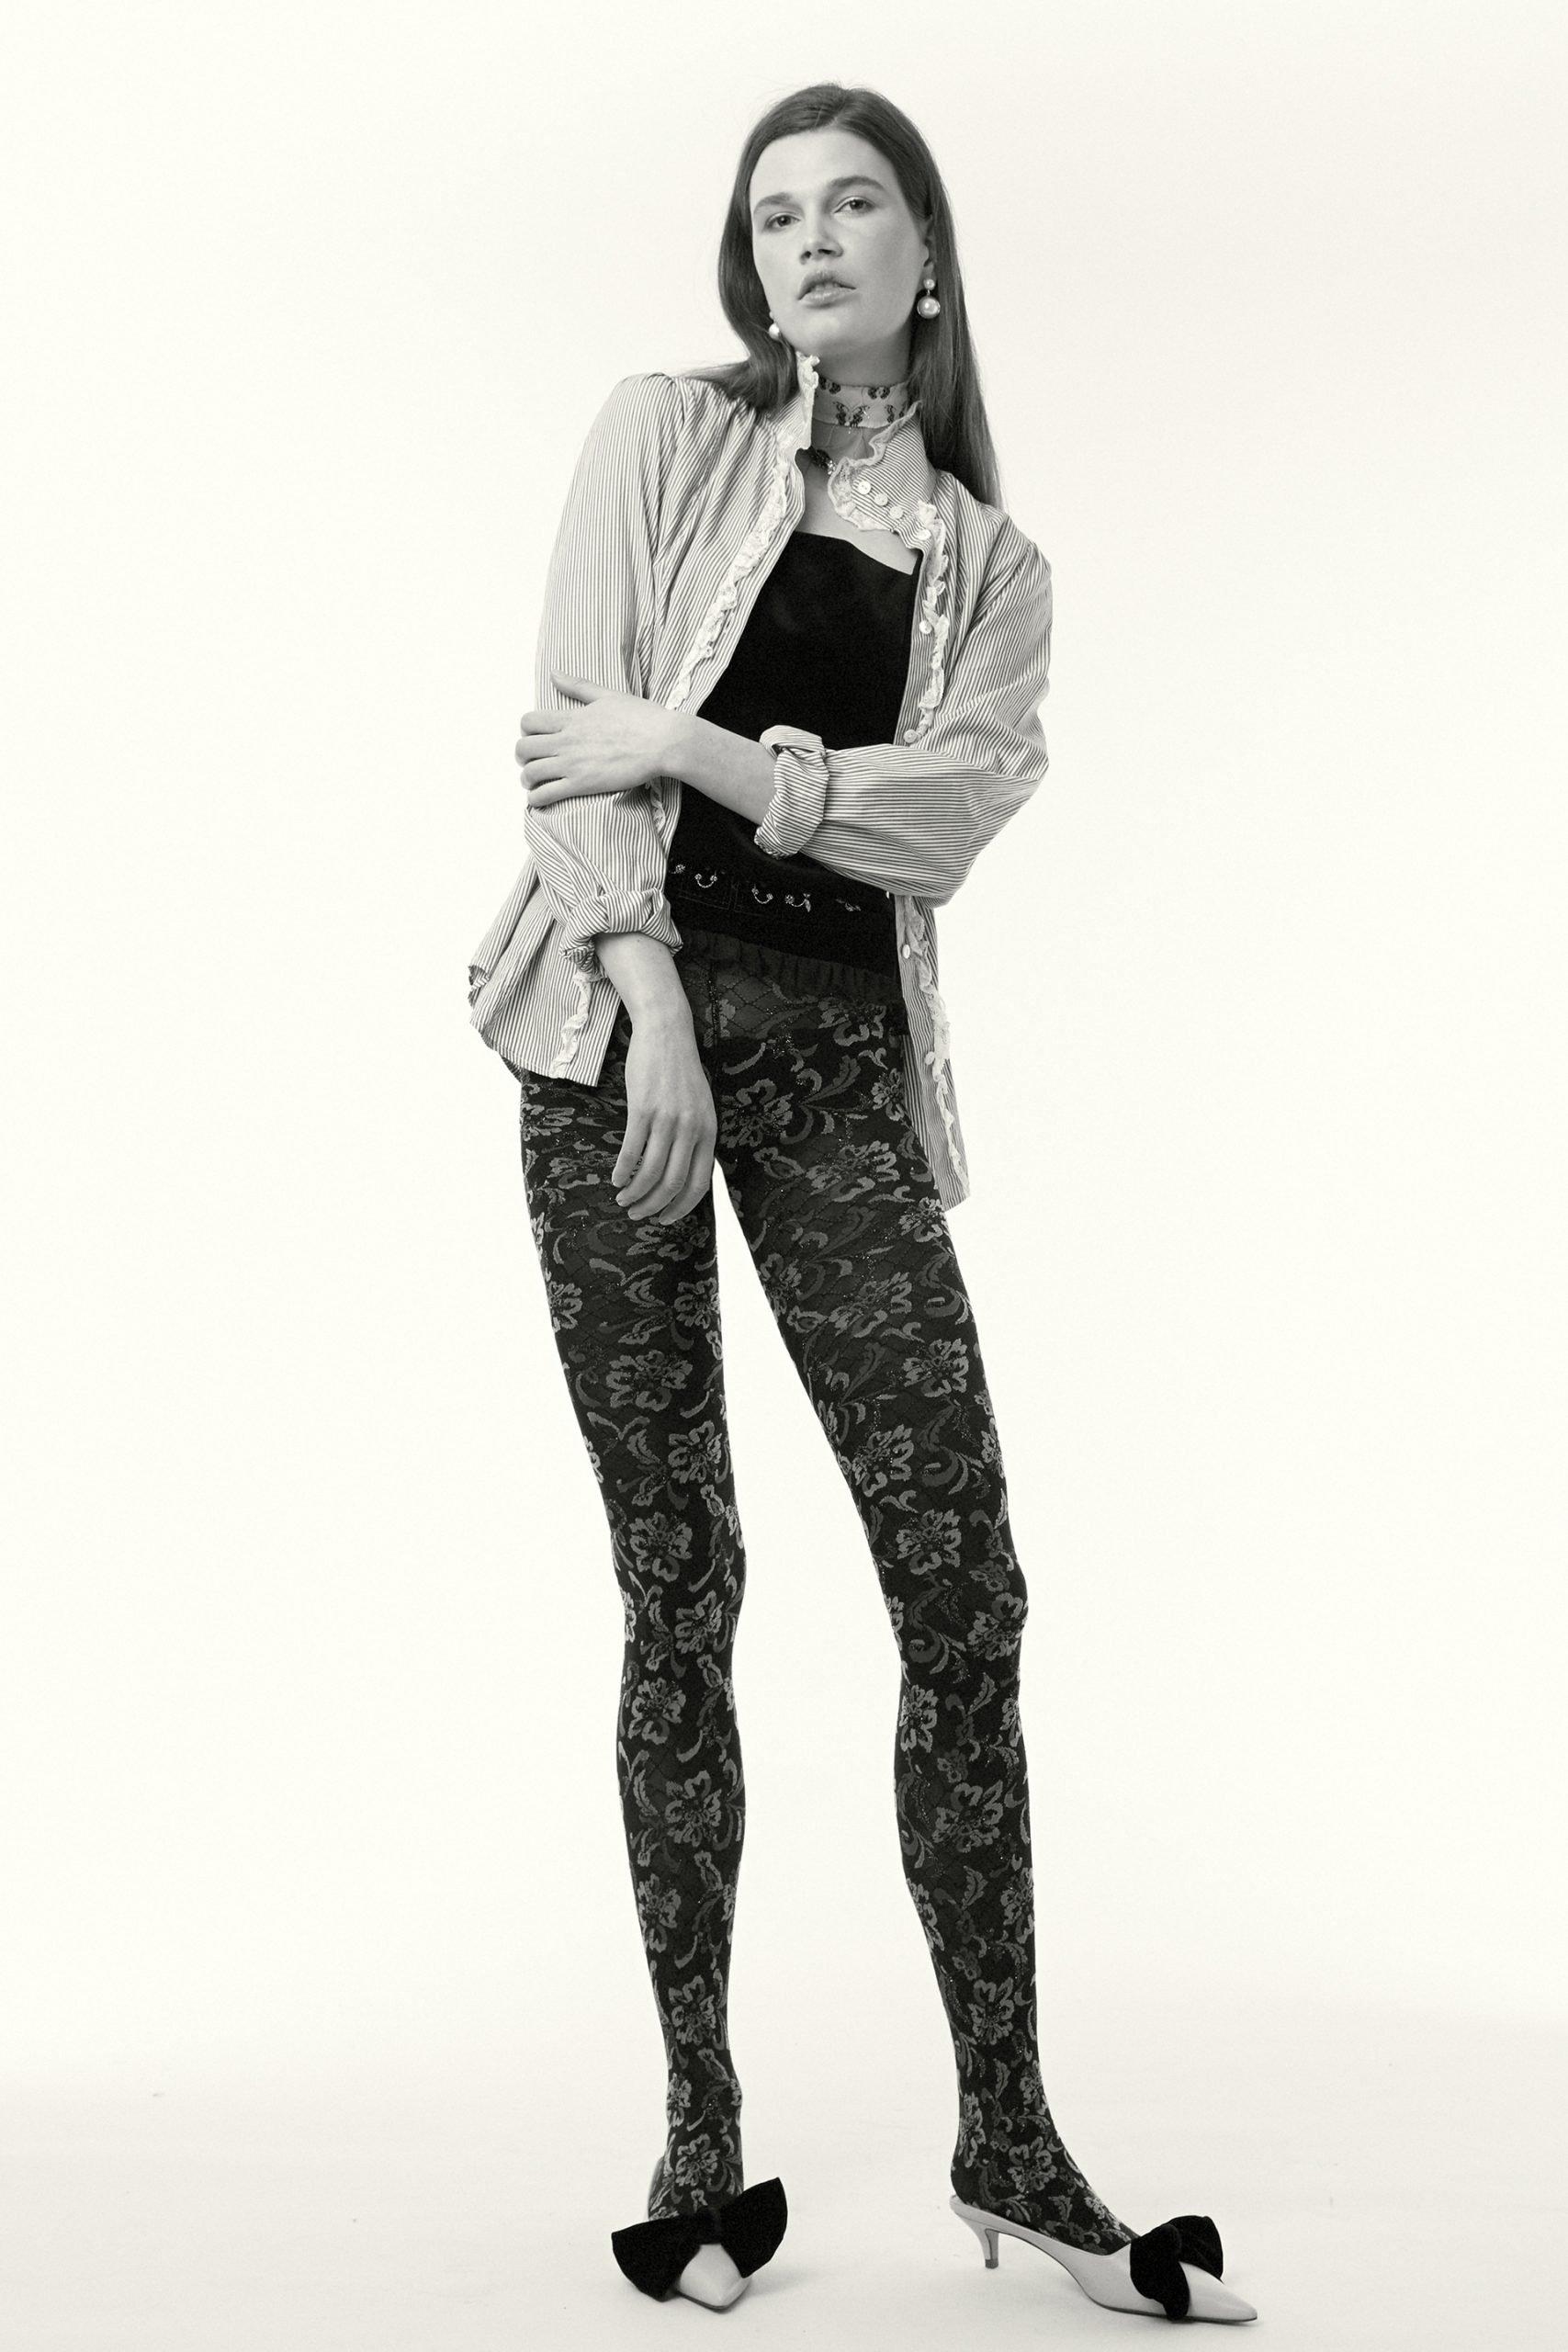 editoriale moda, mirko pedone, fotografia ,styling,